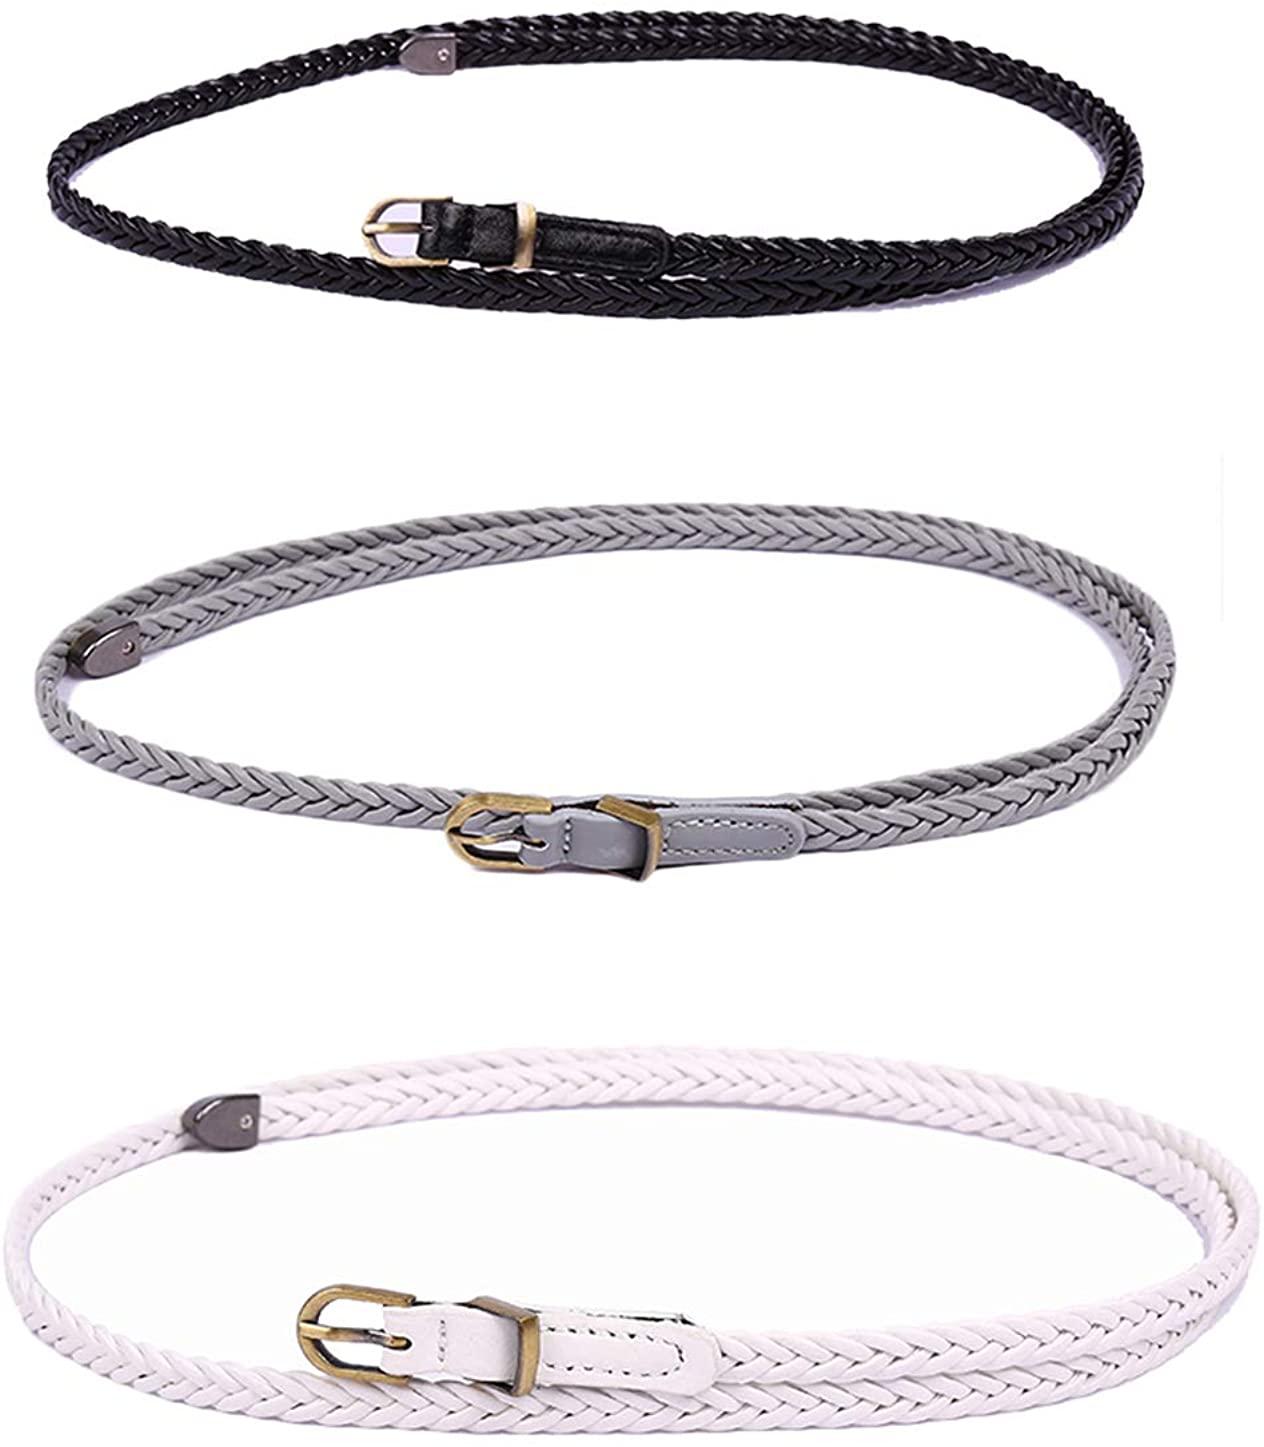 uxcell Women Woven Matel Keeper Arrow Tail Round Pin Buckle Slender Waist Belt black grey white